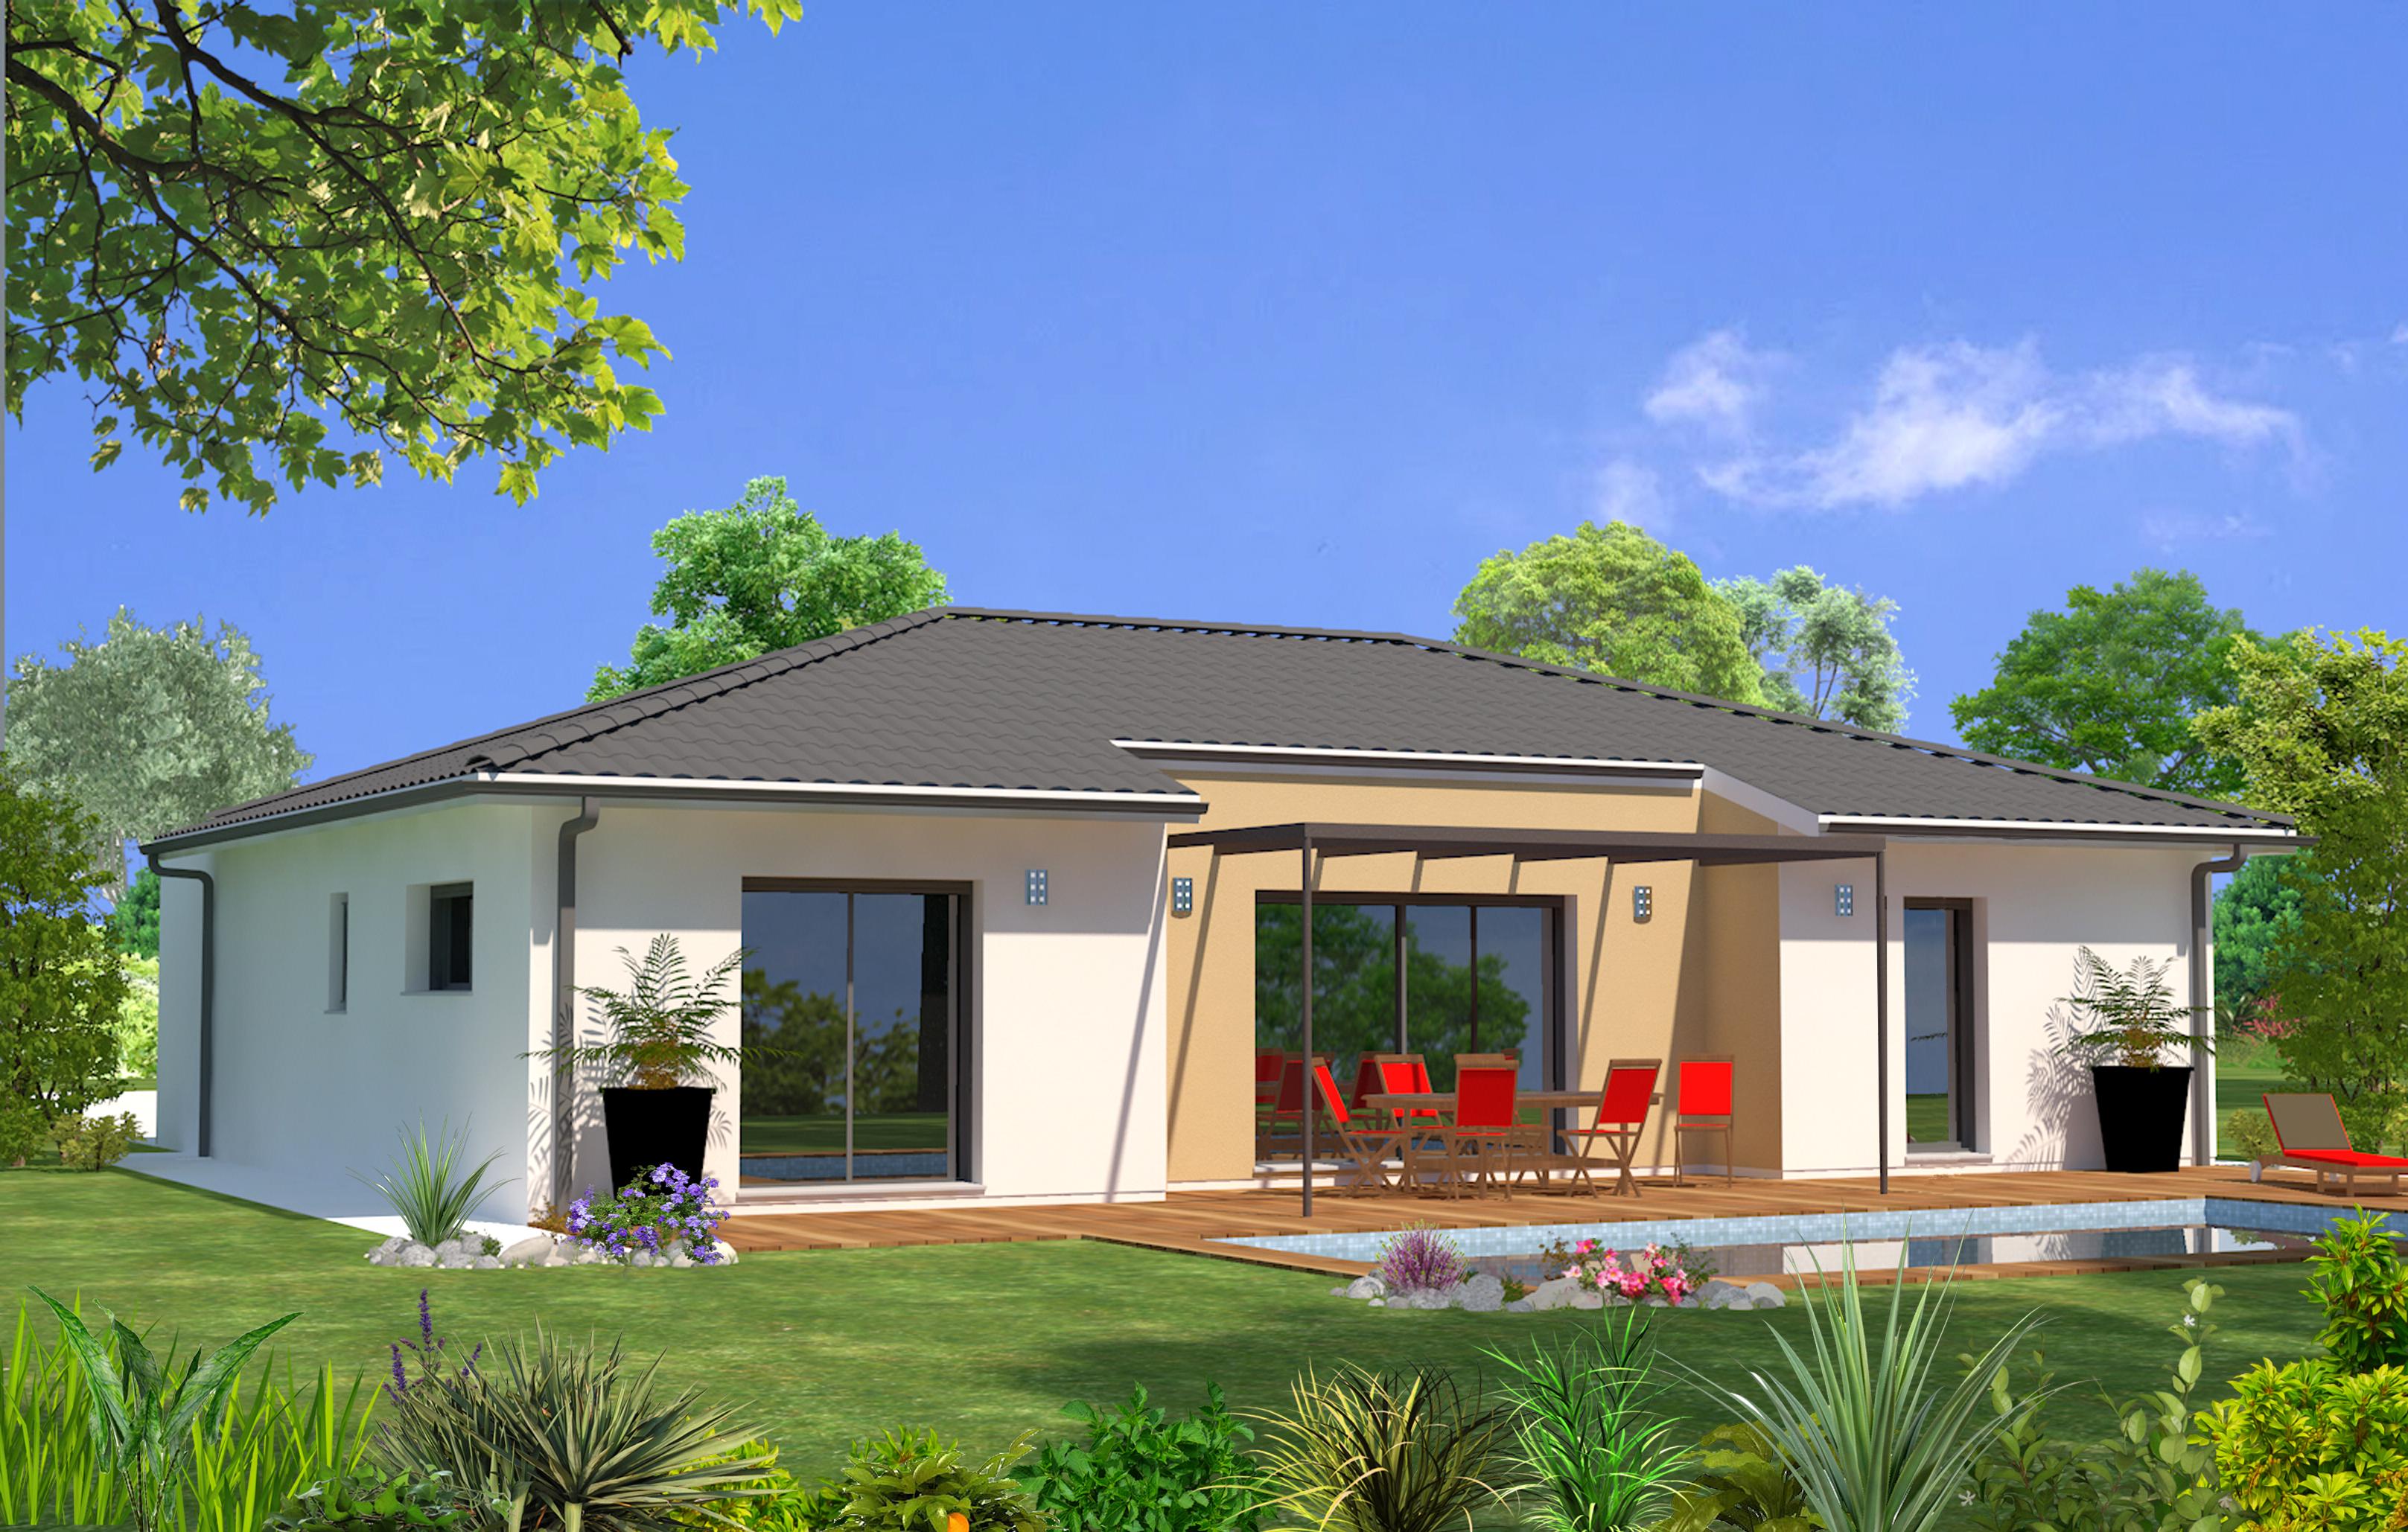 Maeva 33 maisons lara for Modele maison 5 chambres